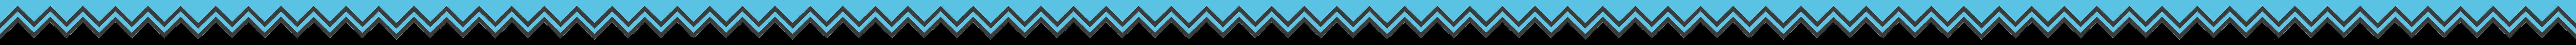 header blauw boven - transparant beneden